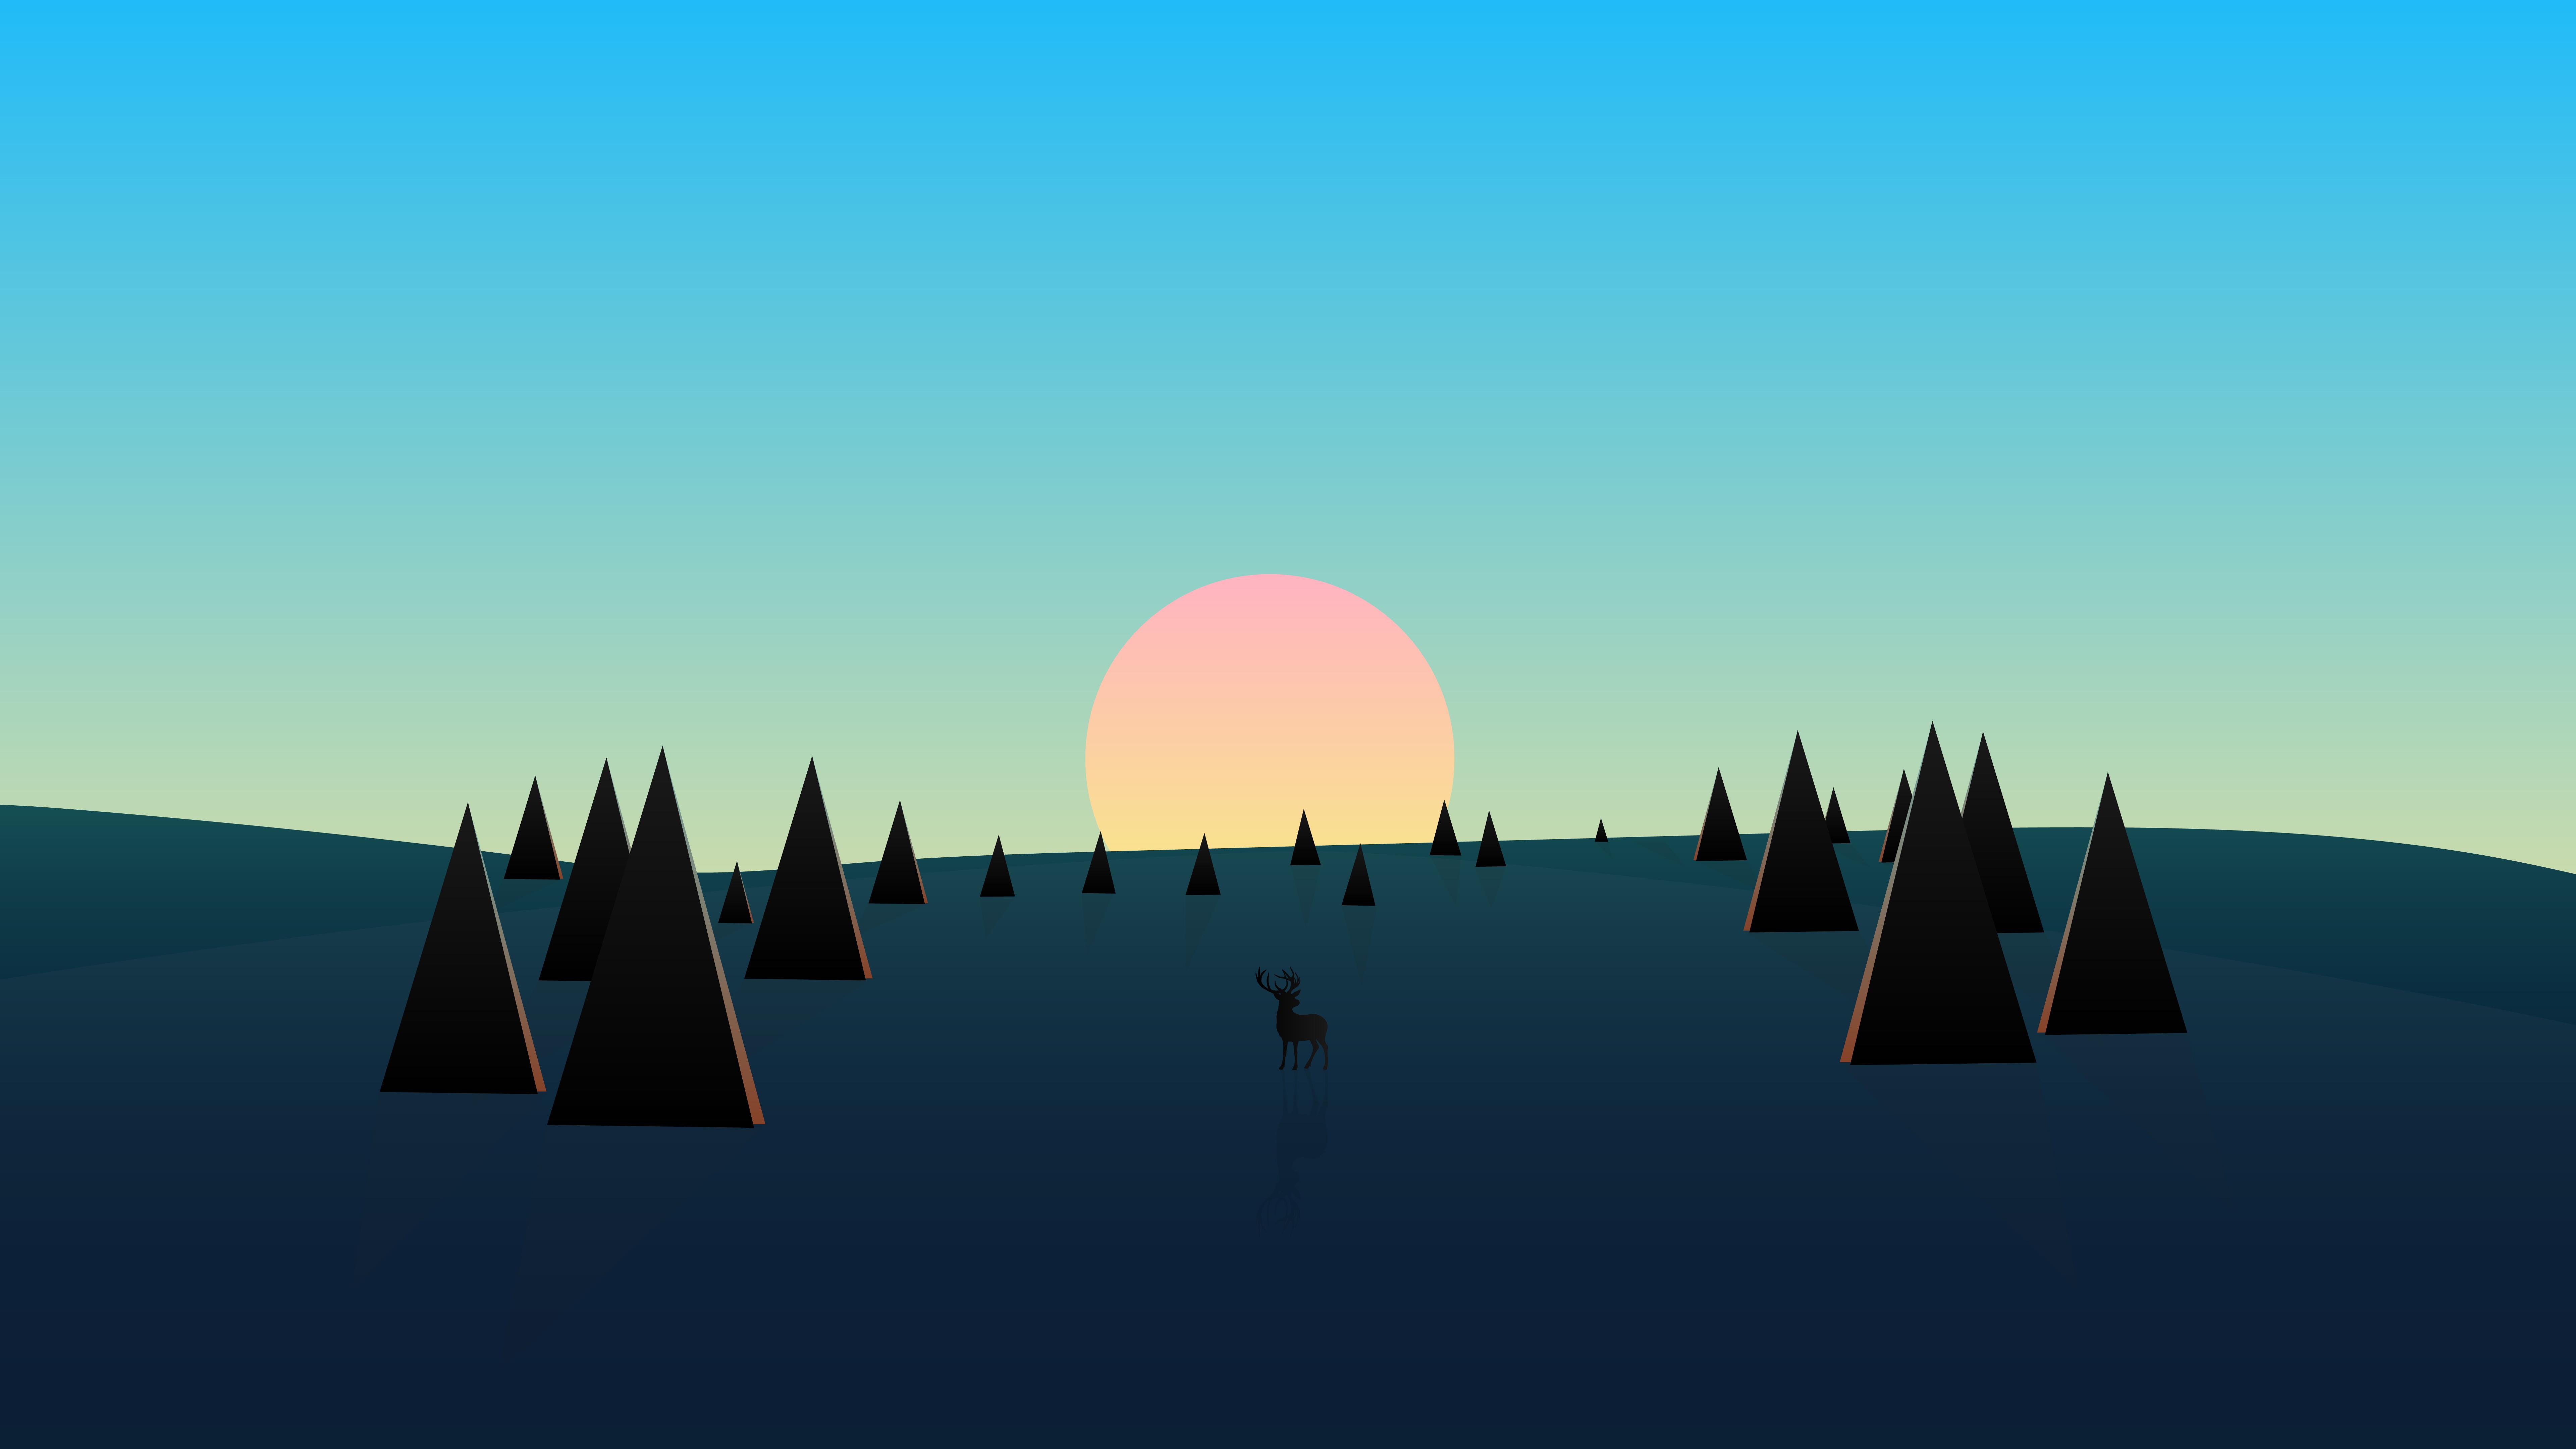 beautiful day sunset deer minimal 4k 1608658609 - Beautiful Day Sunset Deer Minimal 4k - Beautiful Day Sunset Deer Minimal 4k wallpapers